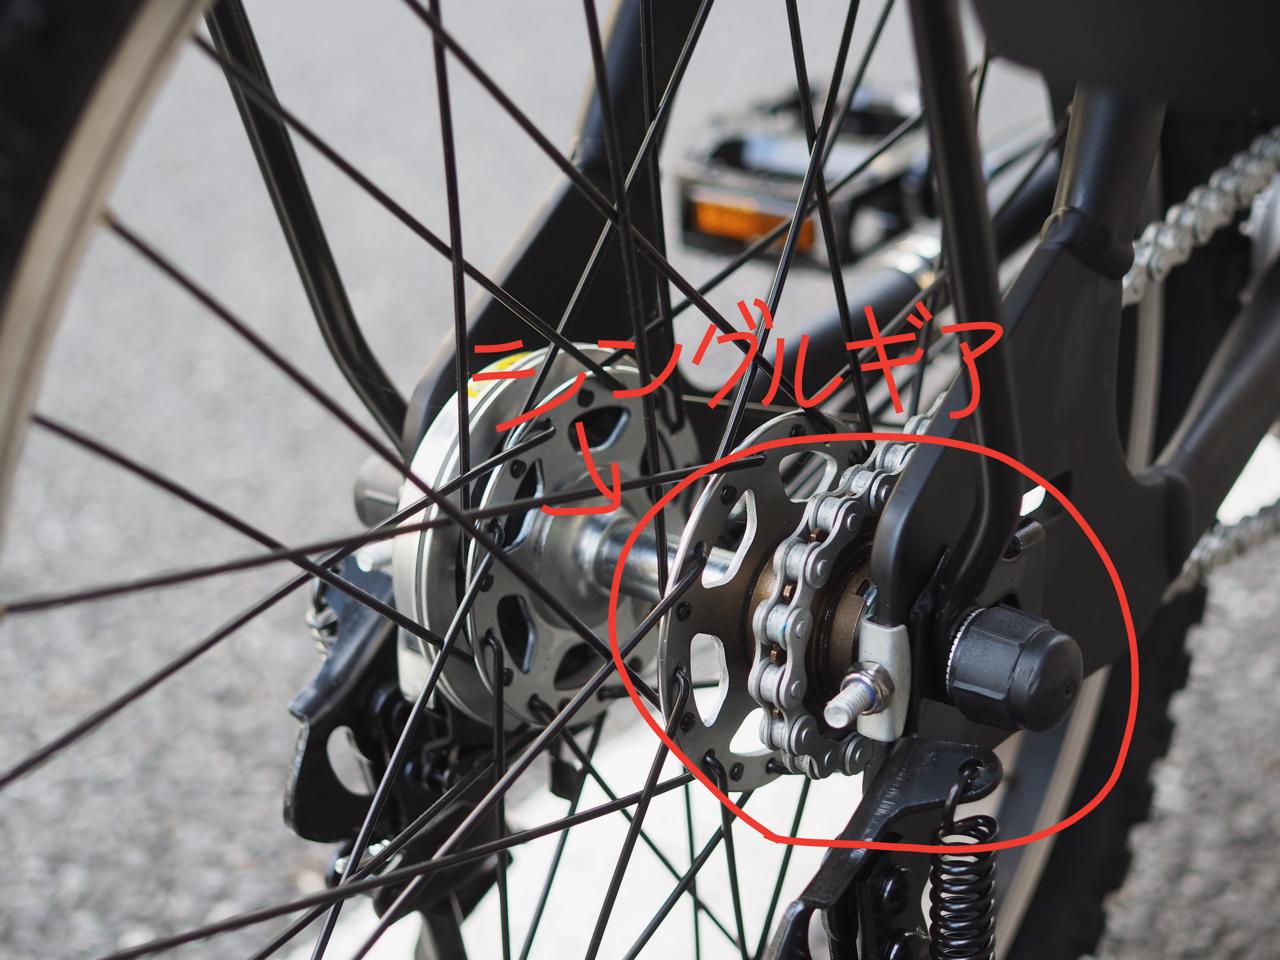 panasonic,ez,sw,yepp,yeppcargo,ogk,grandia,電動自転車,イェップ,イェップカーゴ,グランディア,電動自転車カスタム